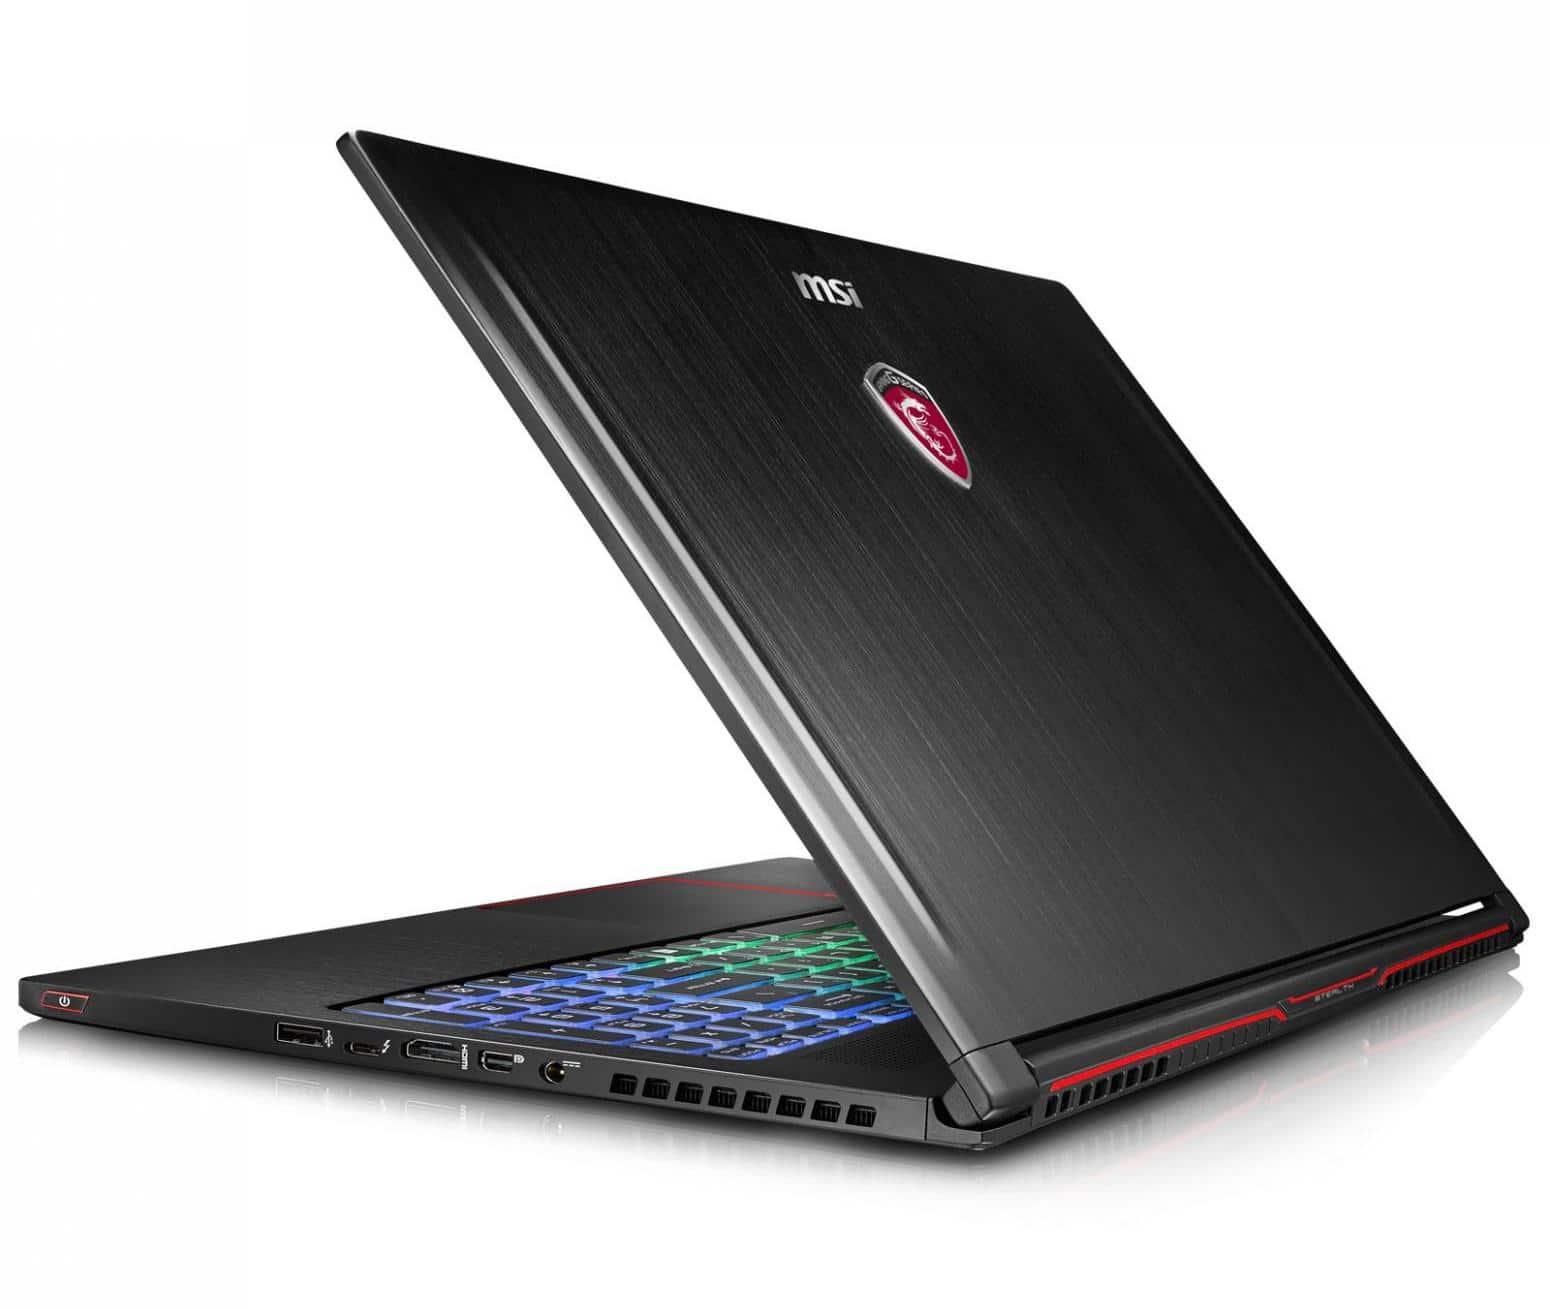 MSI GS63VR 6RF-019, ultrabook 15 pouces 16Go GTX 1060 SSD256 i7 à 1799€